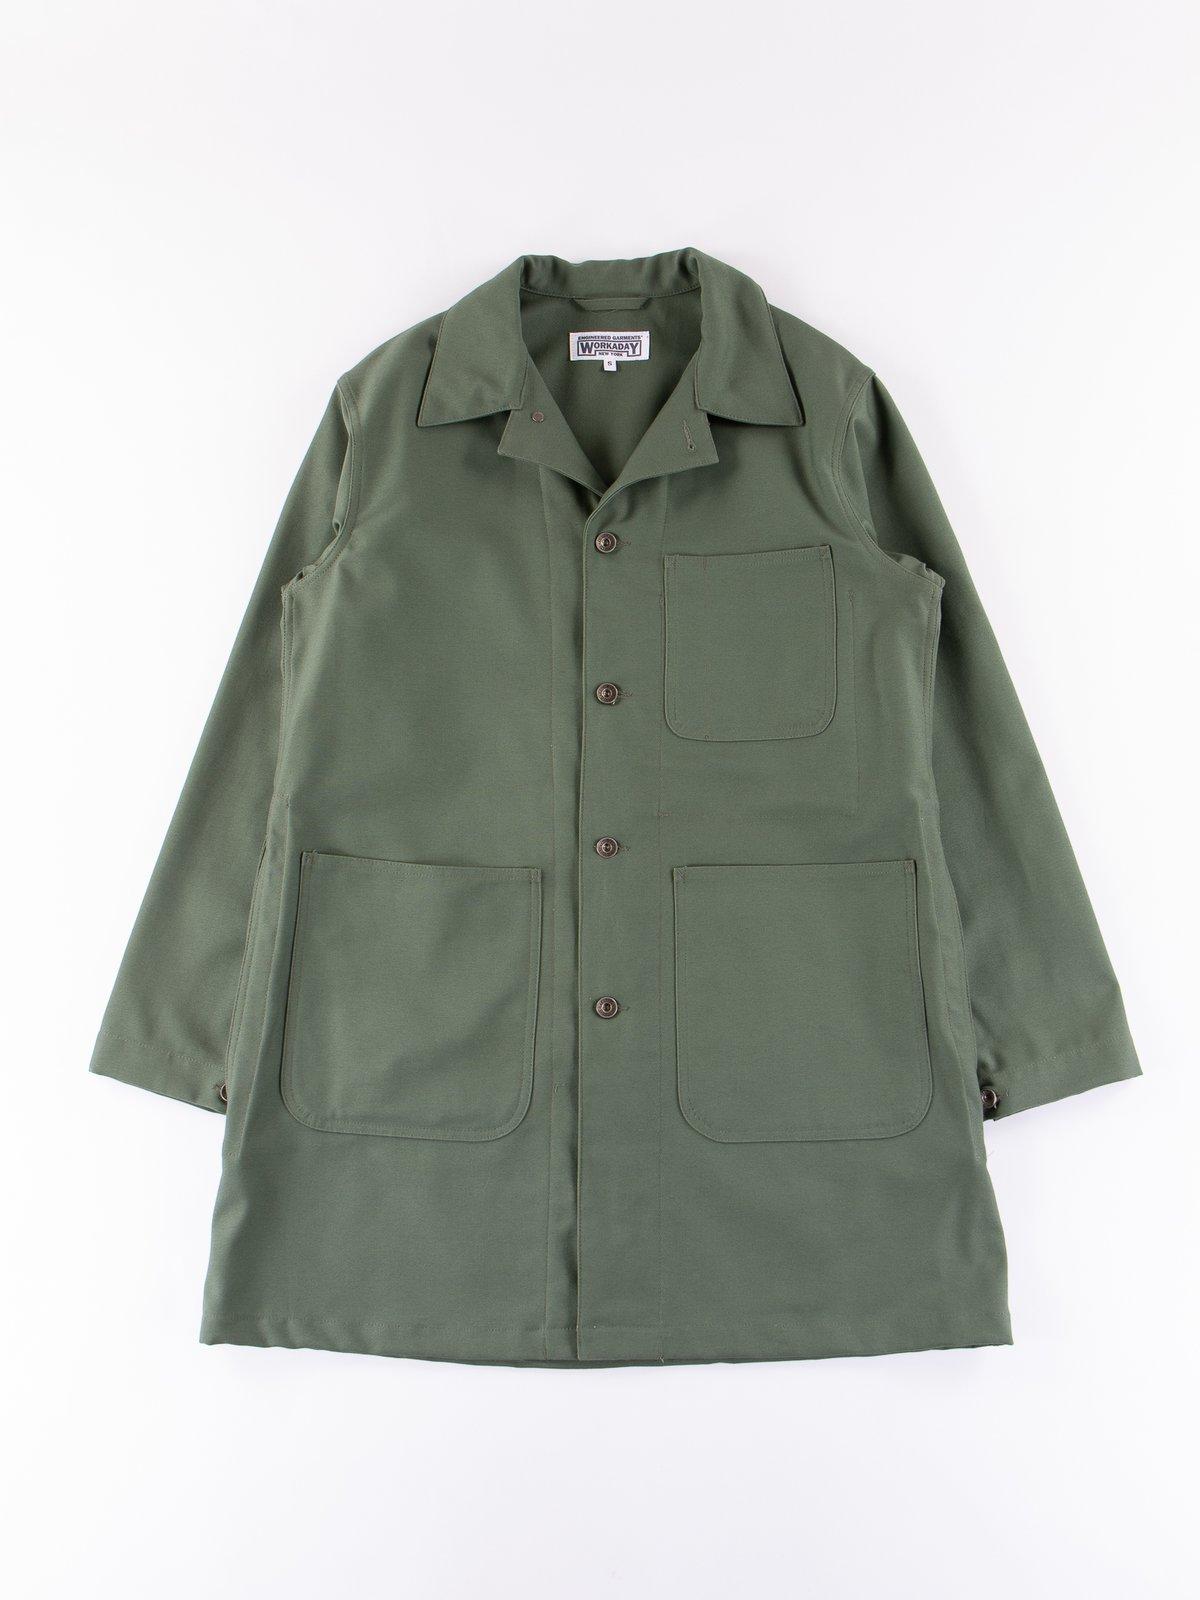 Olive Reversed Sateen Shop Coat - Image 1